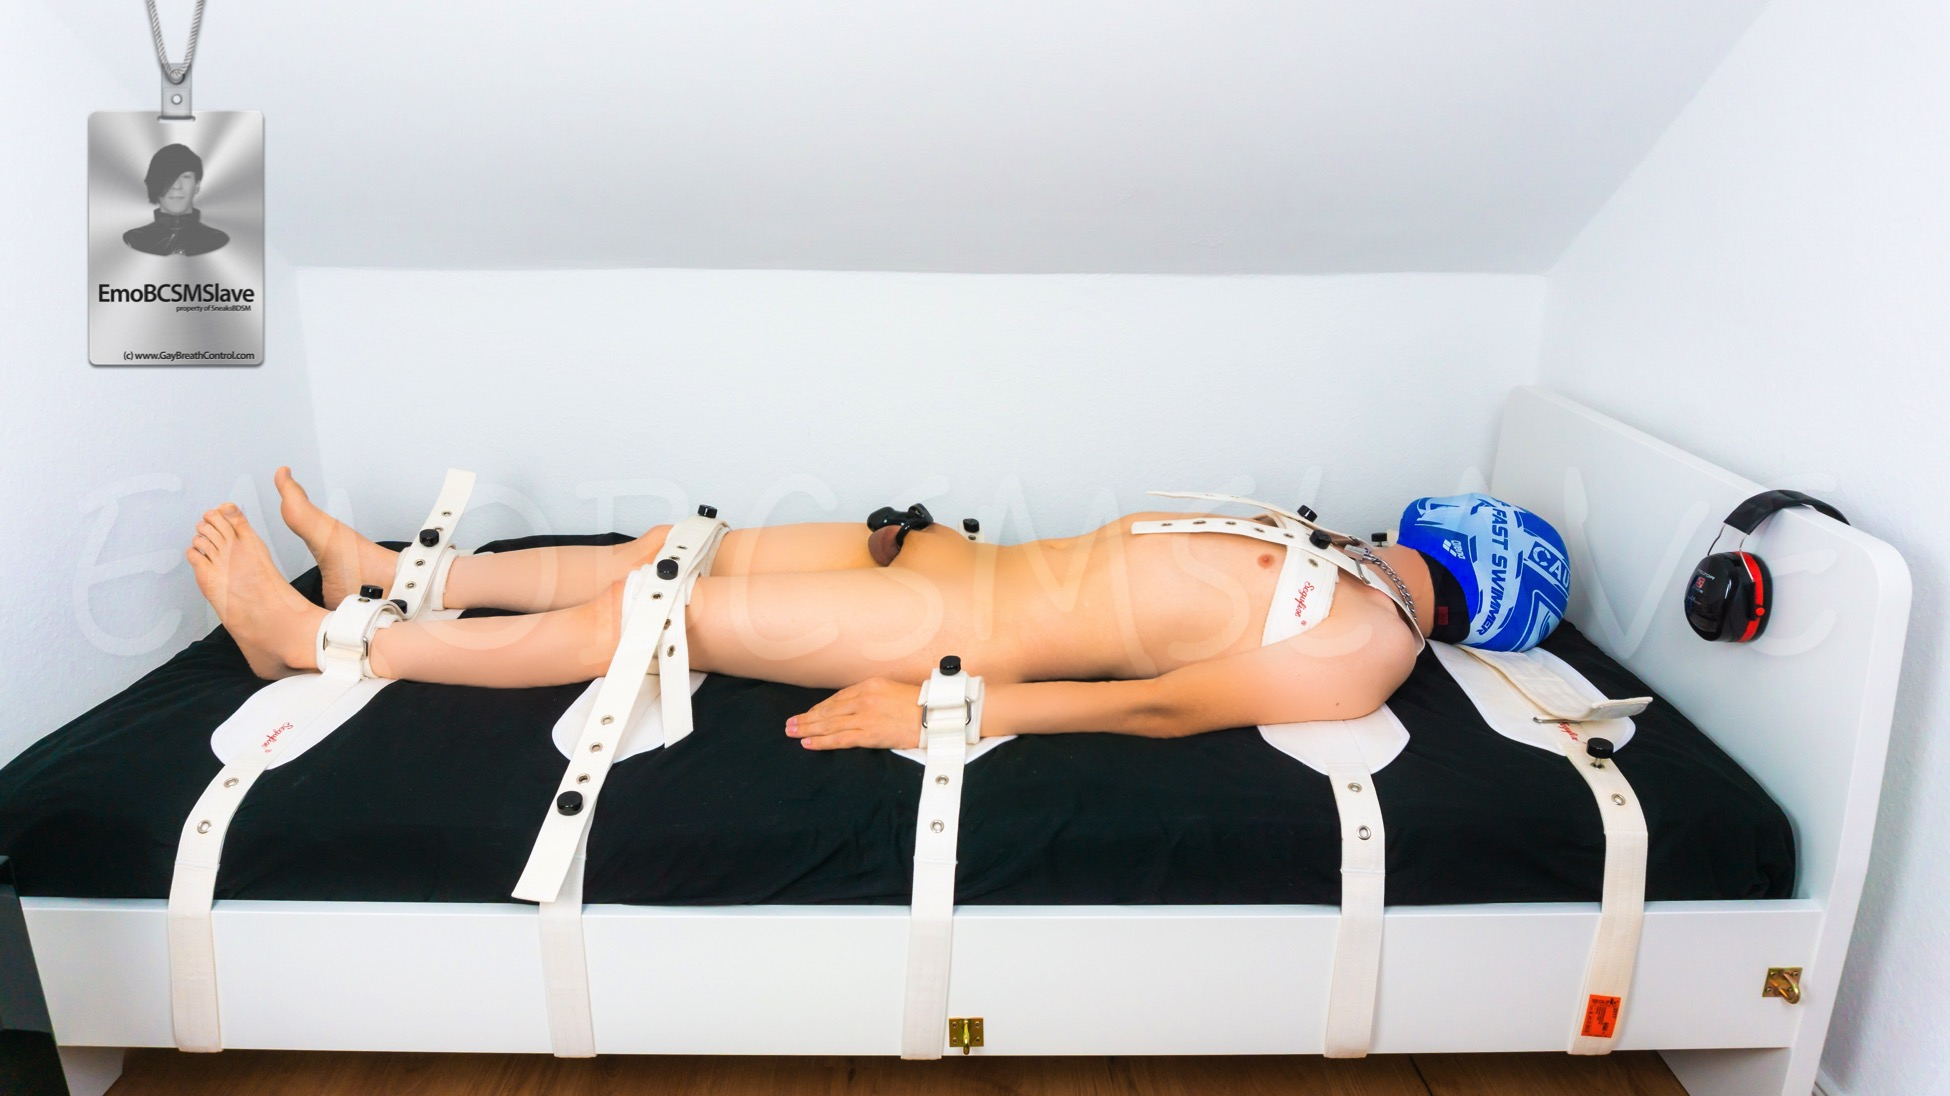 Nude EmoBCSMSlave swim cap breath controlled